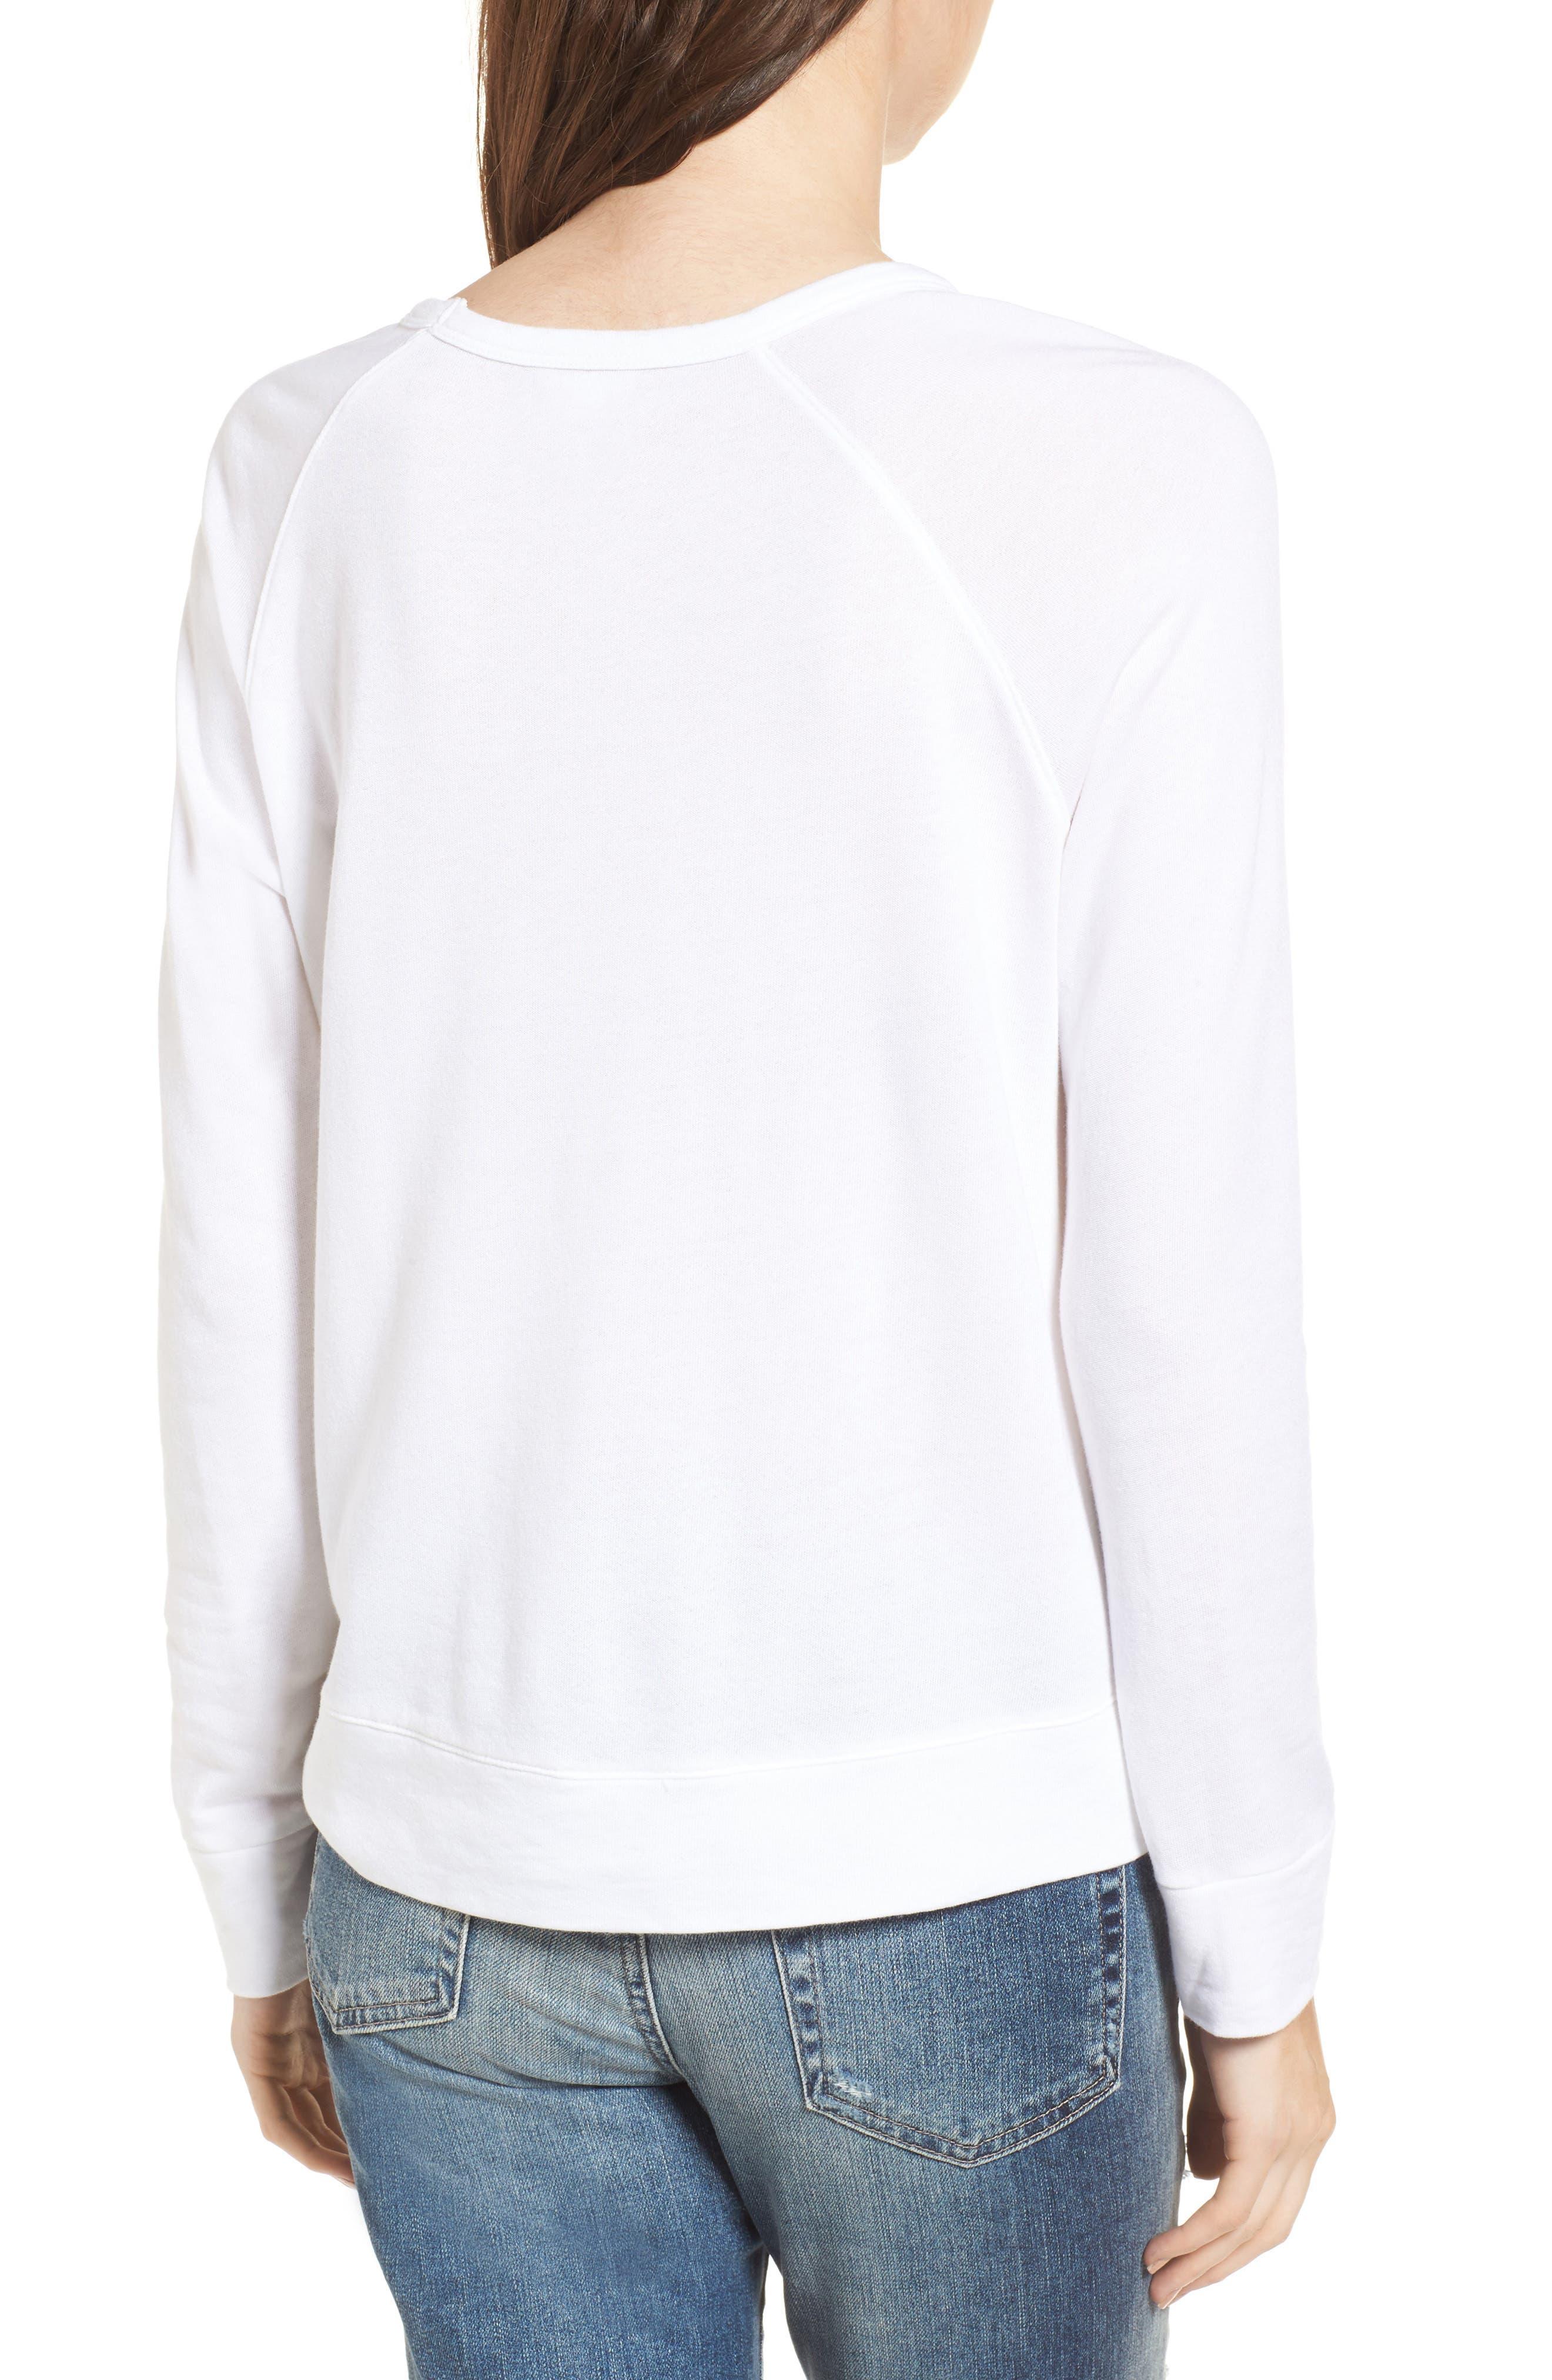 Winter Wonderland Sweatshirt,                             Alternate thumbnail 2, color,                             100